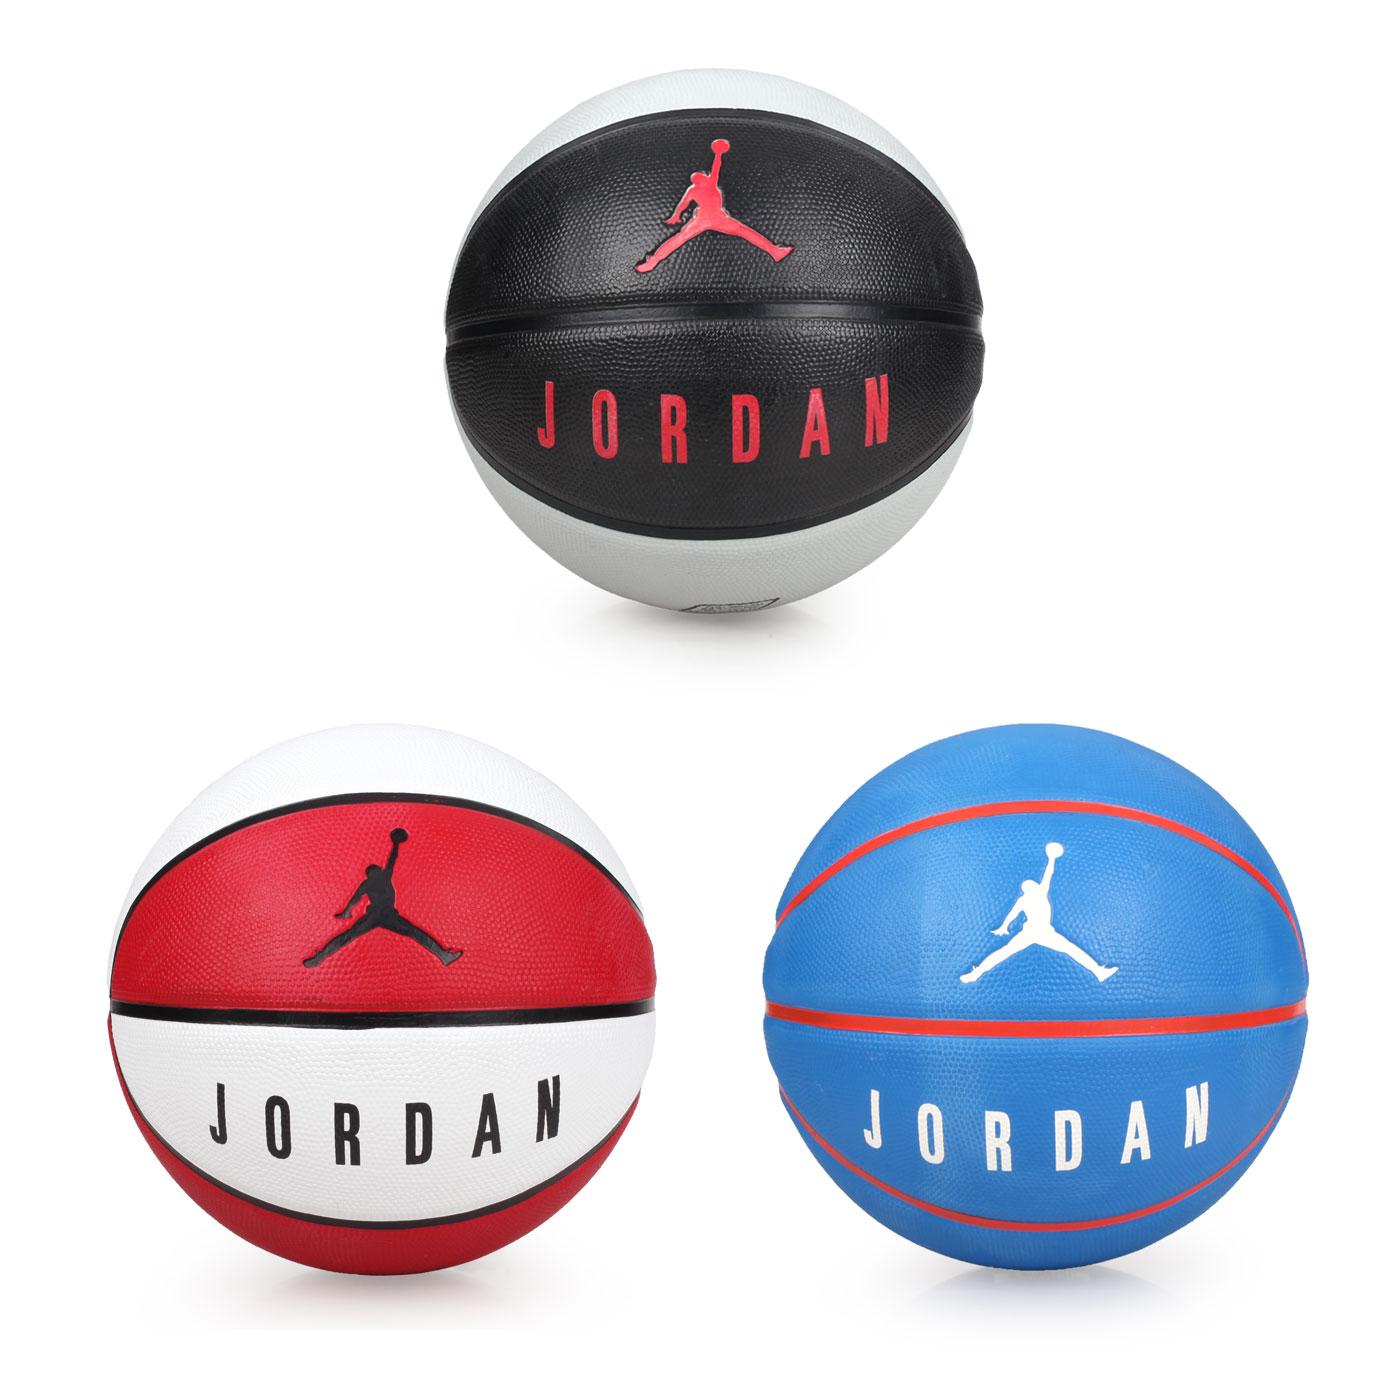 NIKE JORDAN PLAYGROUND 8P 7號籃球 J000186504107